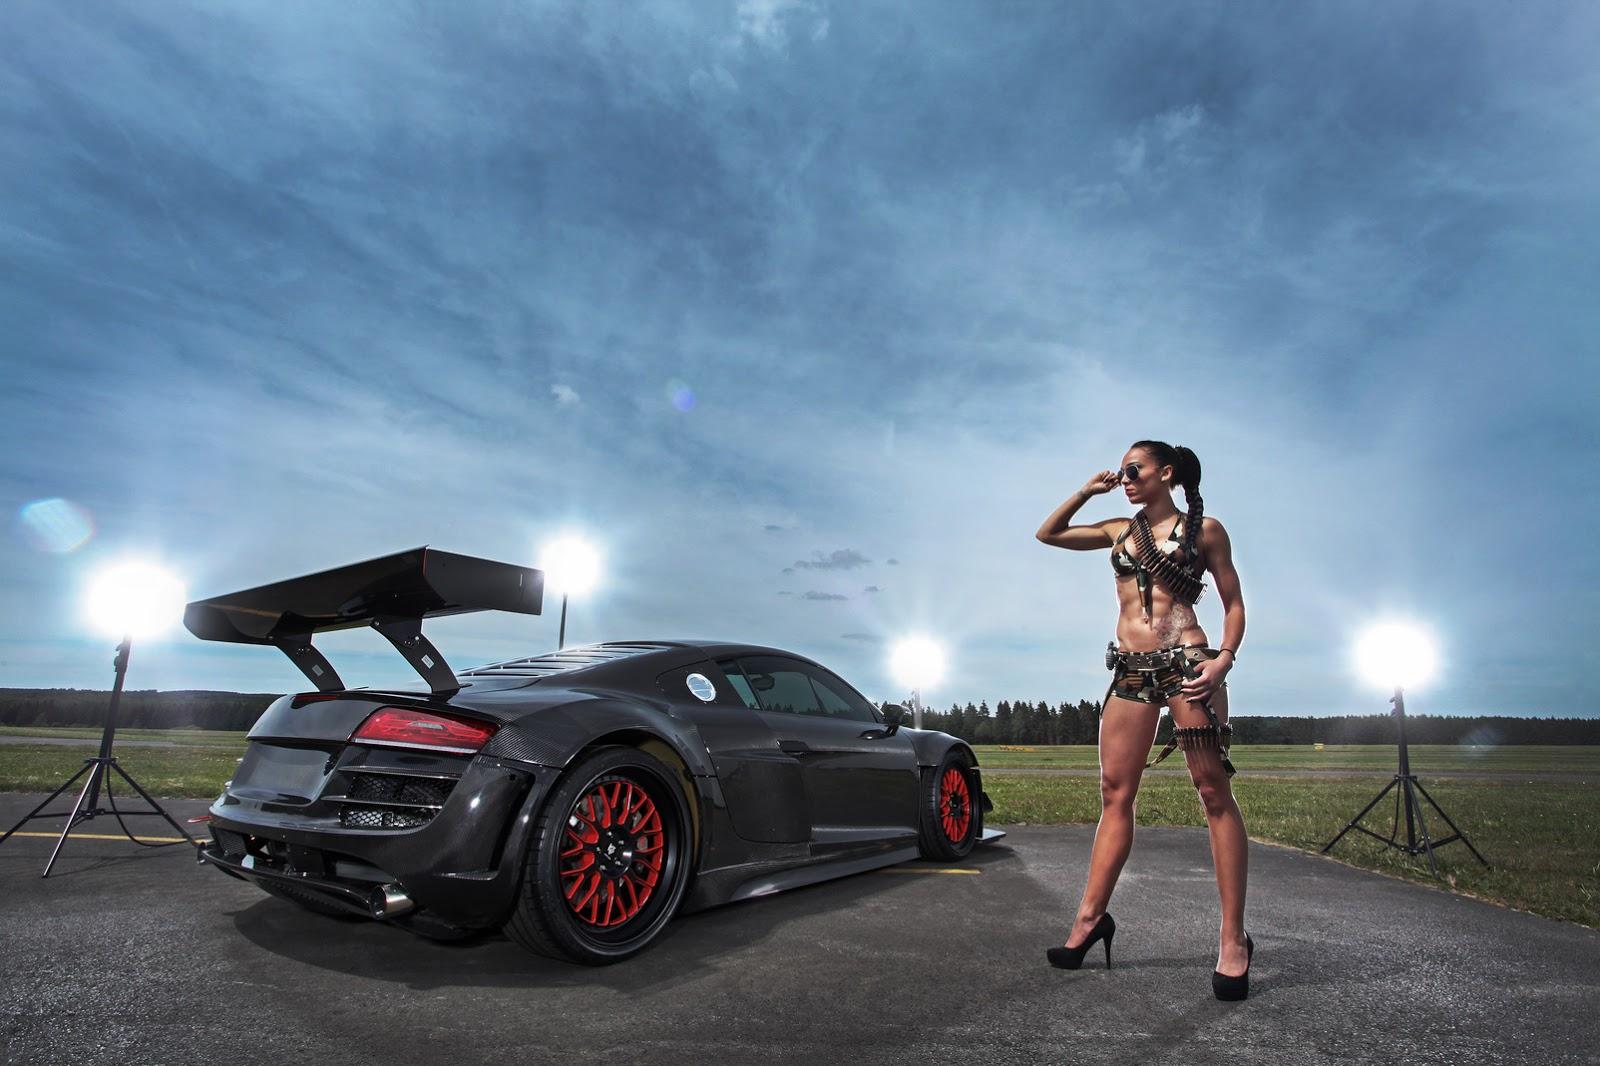 Audi R8 V10 Plus Gets A 950 Hp Makeover Complete With Carbon Fiber Body Autoevolution